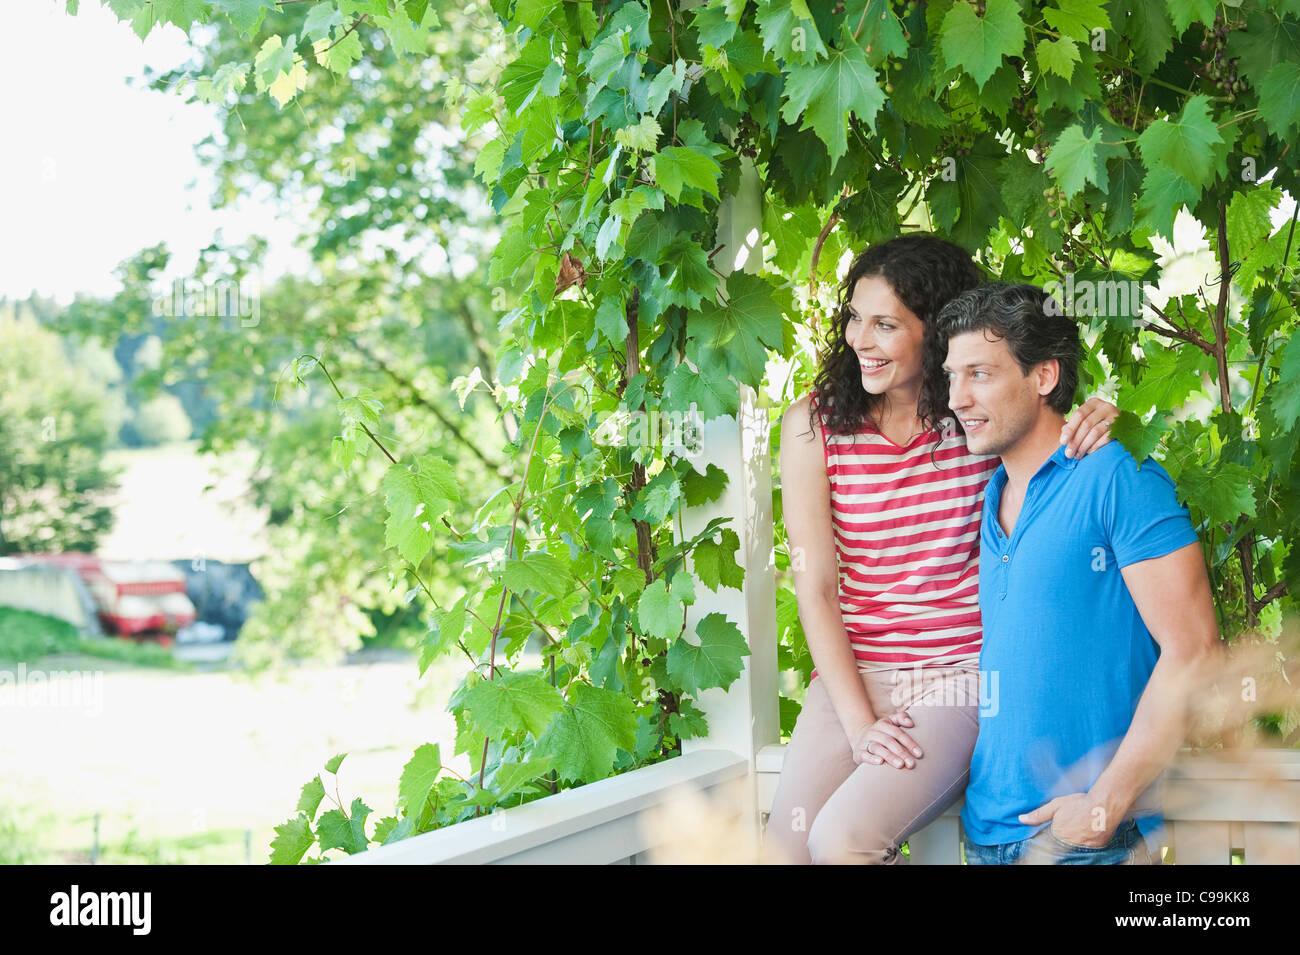 Germany, Bavaria, Couple in garden, smiling - Stock Image